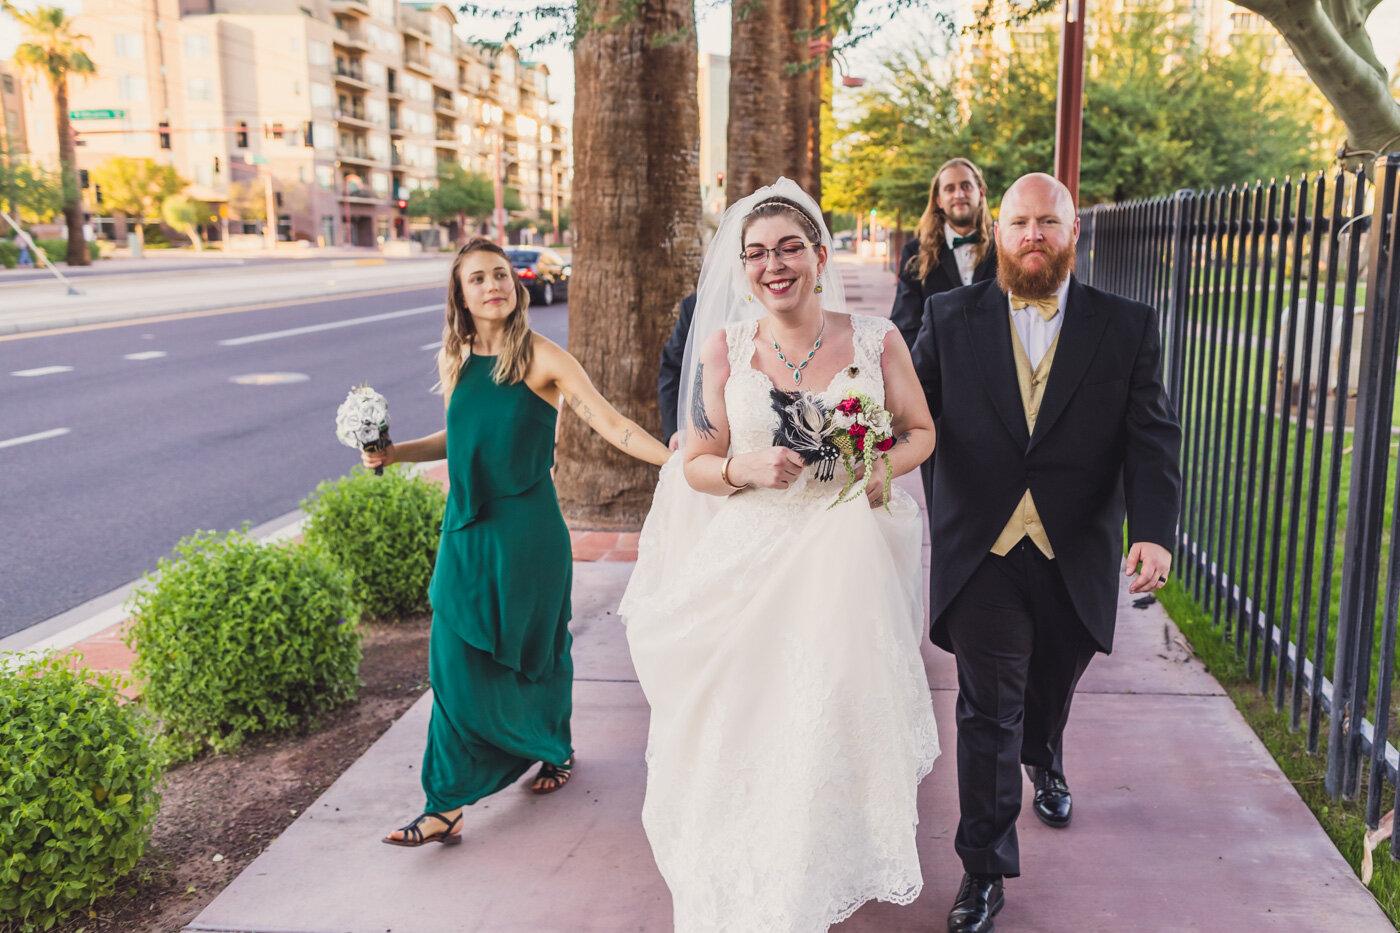 wedding-party-walking-down-phoenix-street